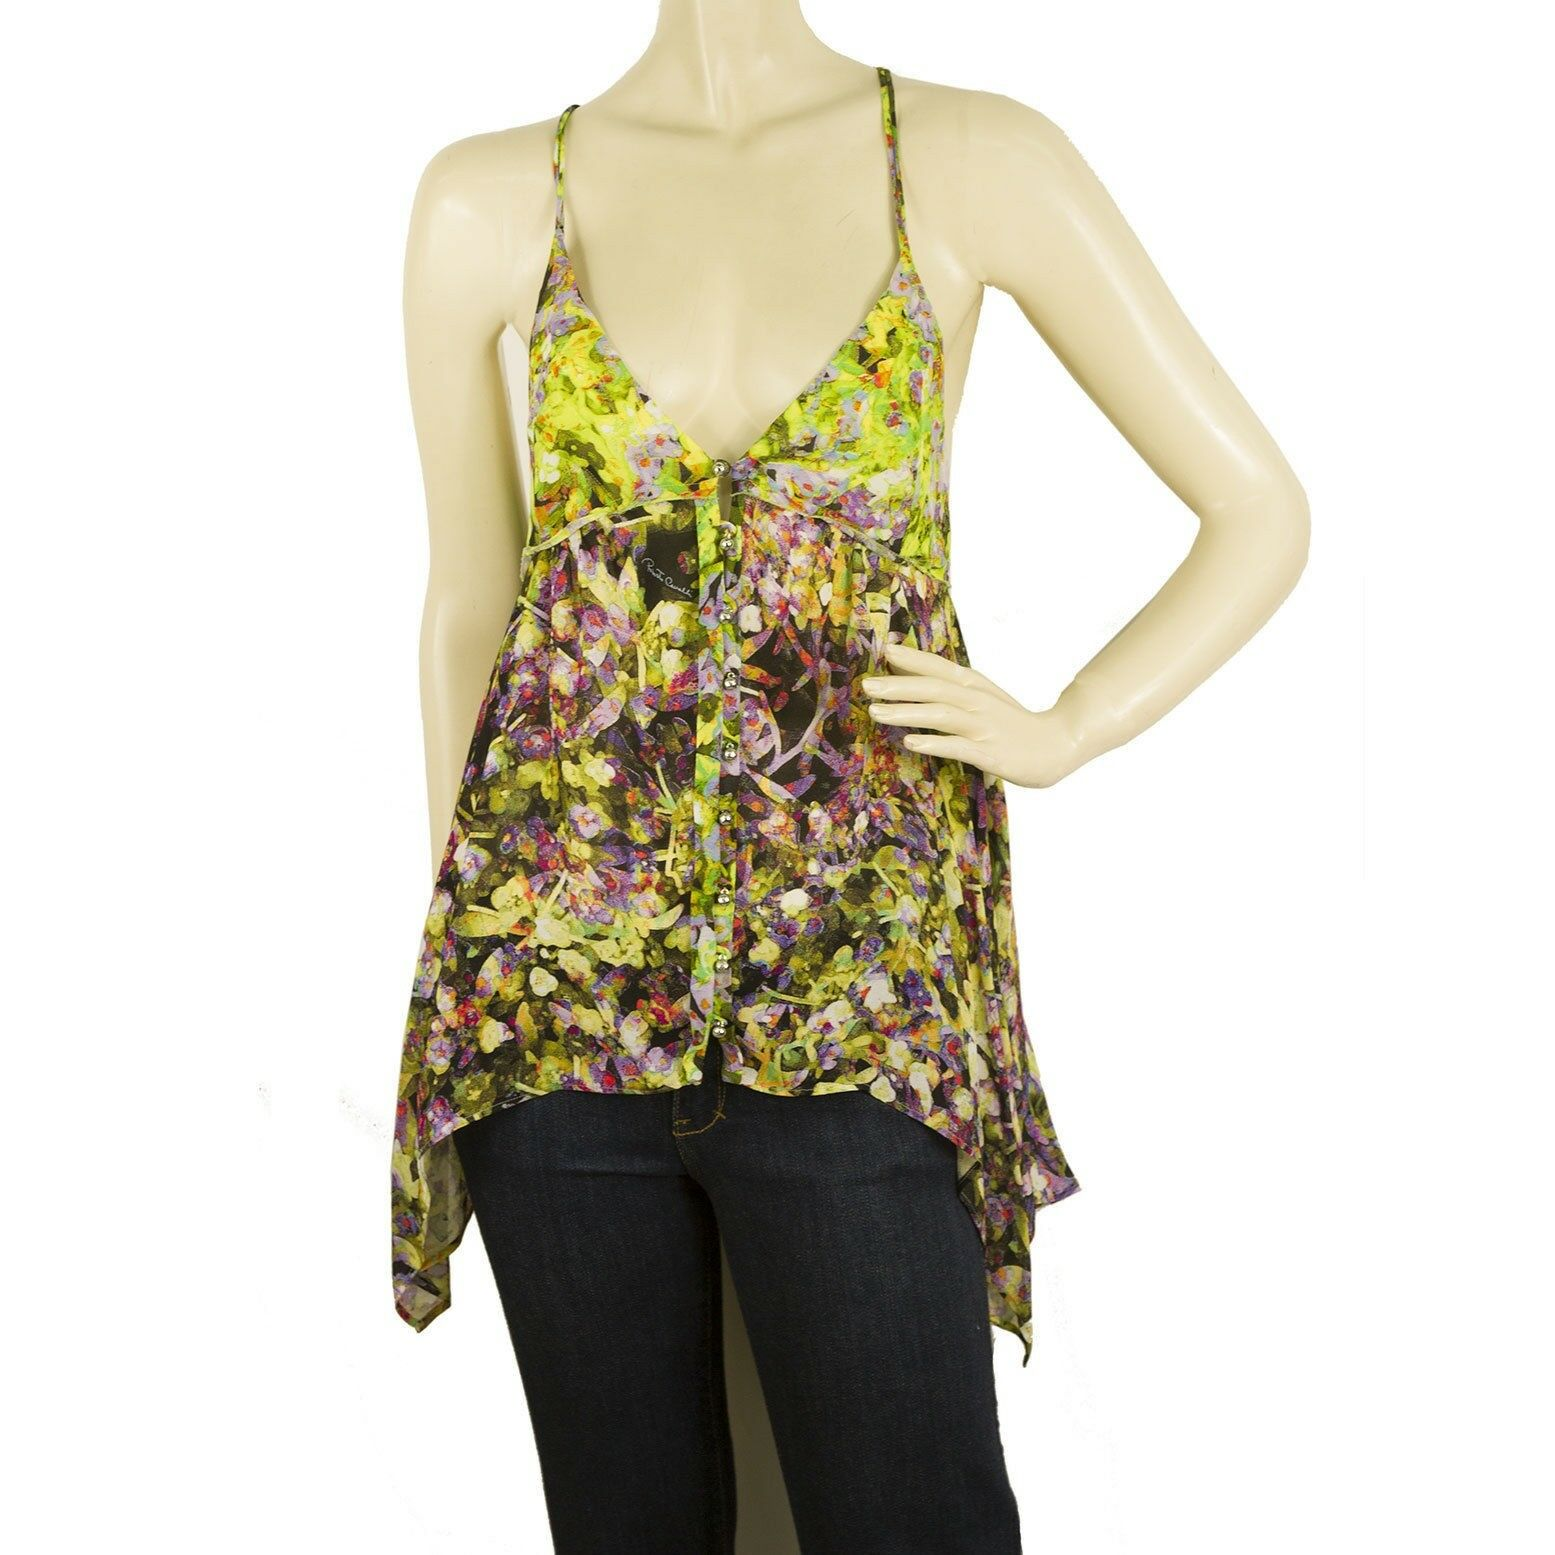 Roberto Cavalli Floral 100% Silk MultiFarbe Cami Top Sleeveless Blouse Größe 38